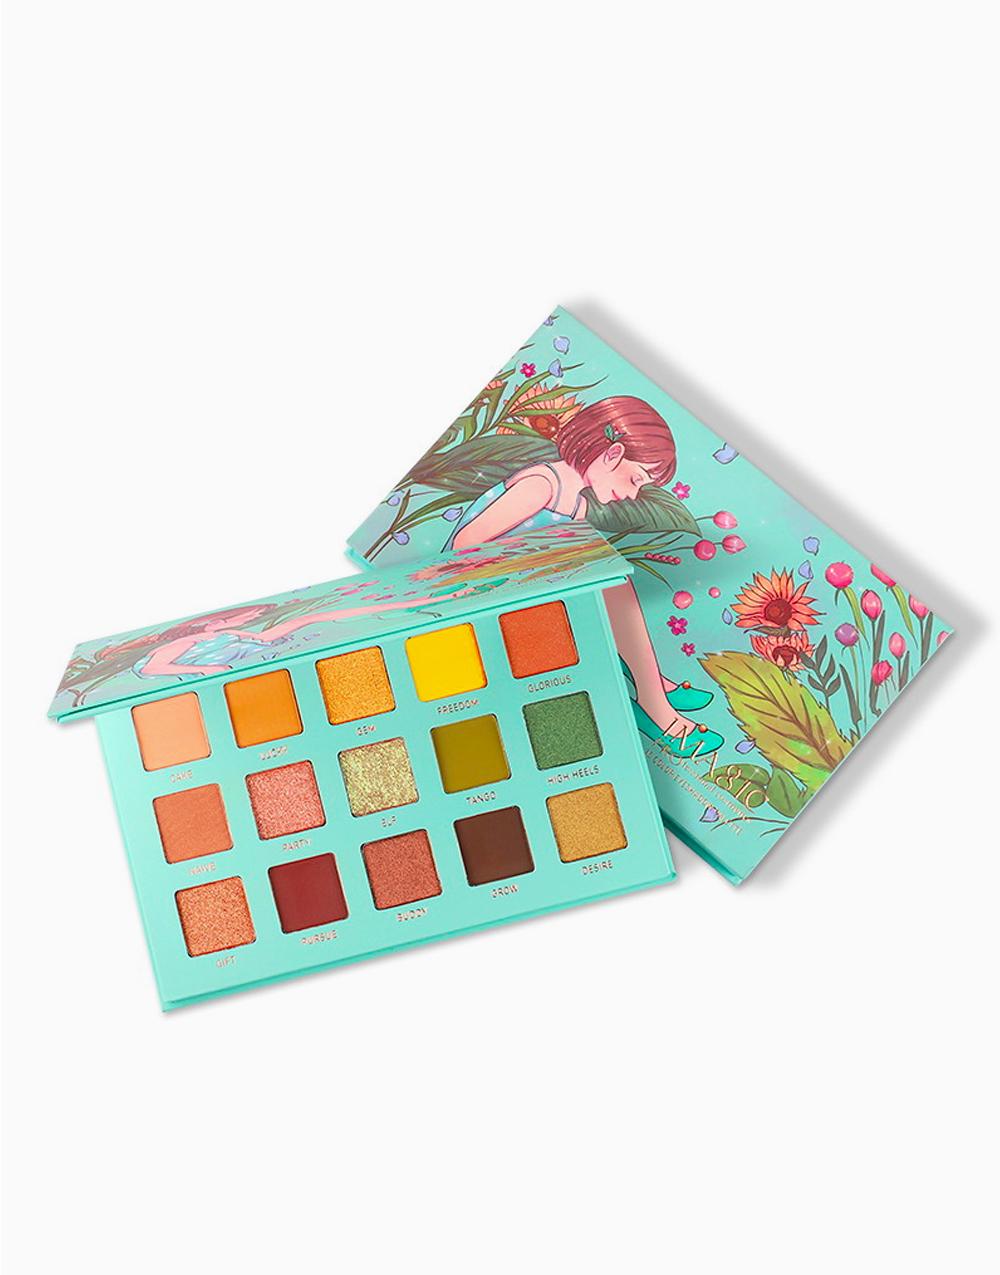 High Heels Baby 15-Color Eyeshadow Palette by Imagic